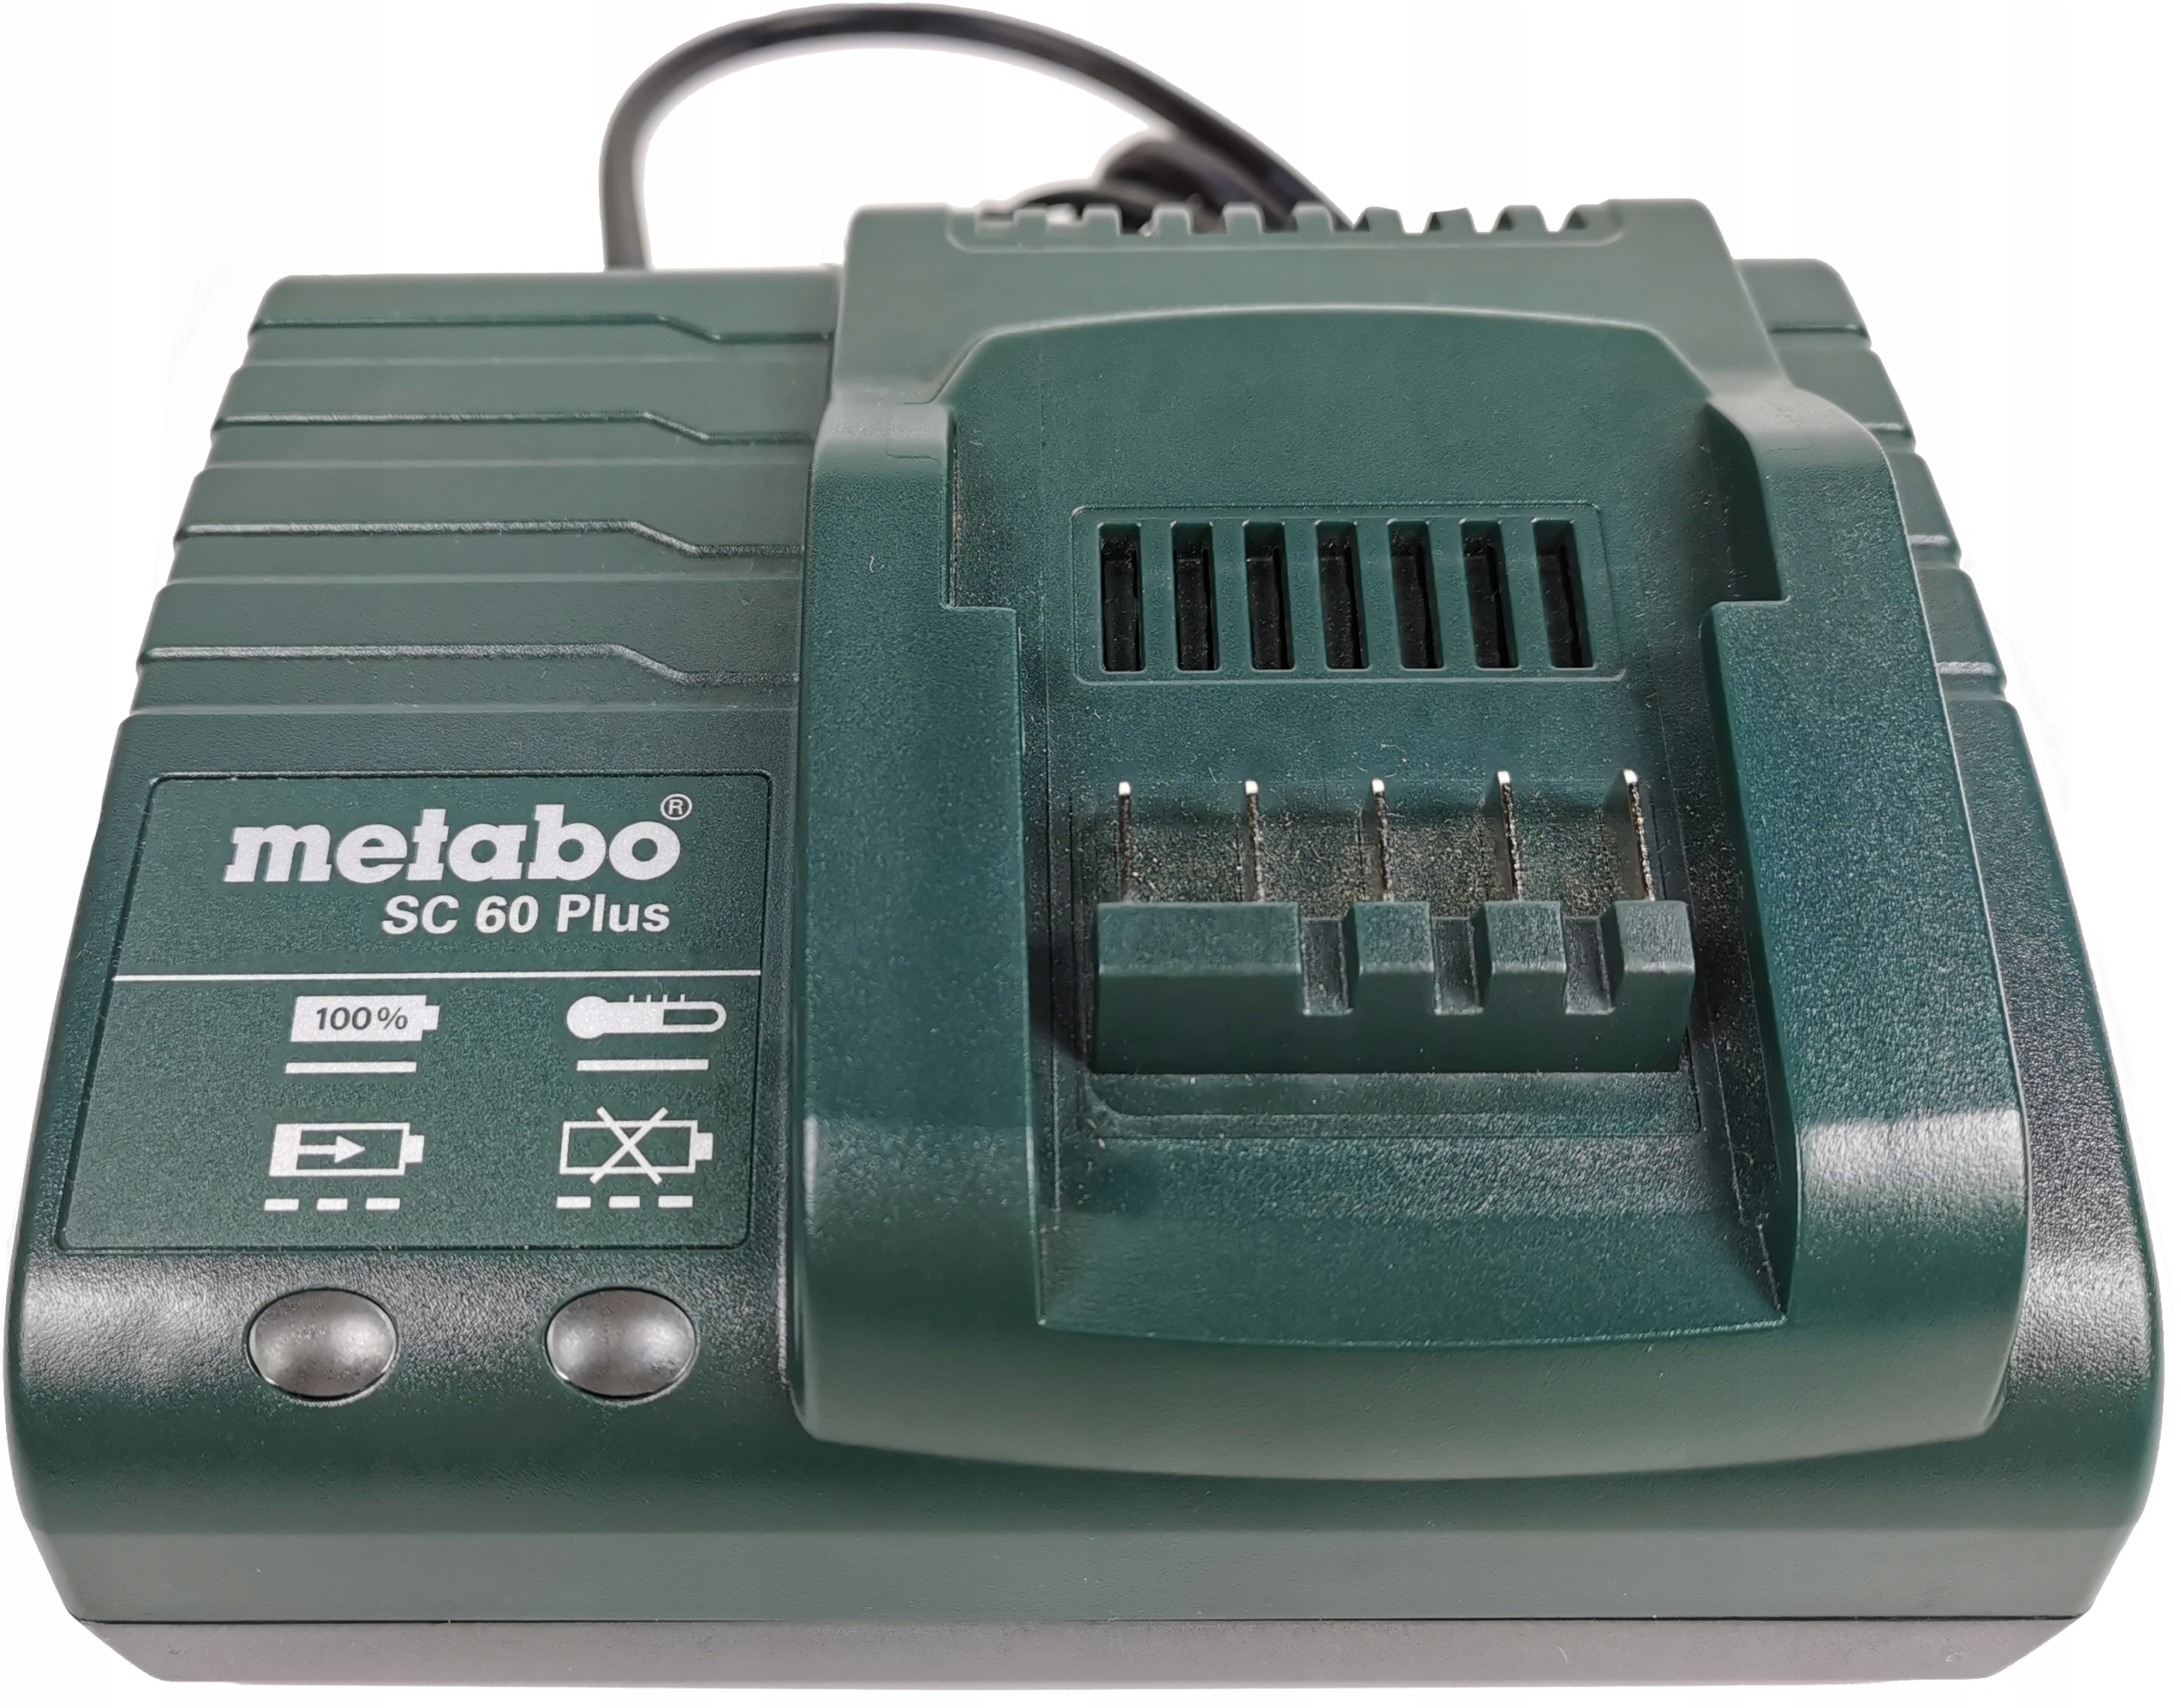 METABO SC 60 Plus ładowarka do aku 10,8 - 18V 1,5A Kod produktu 27048000